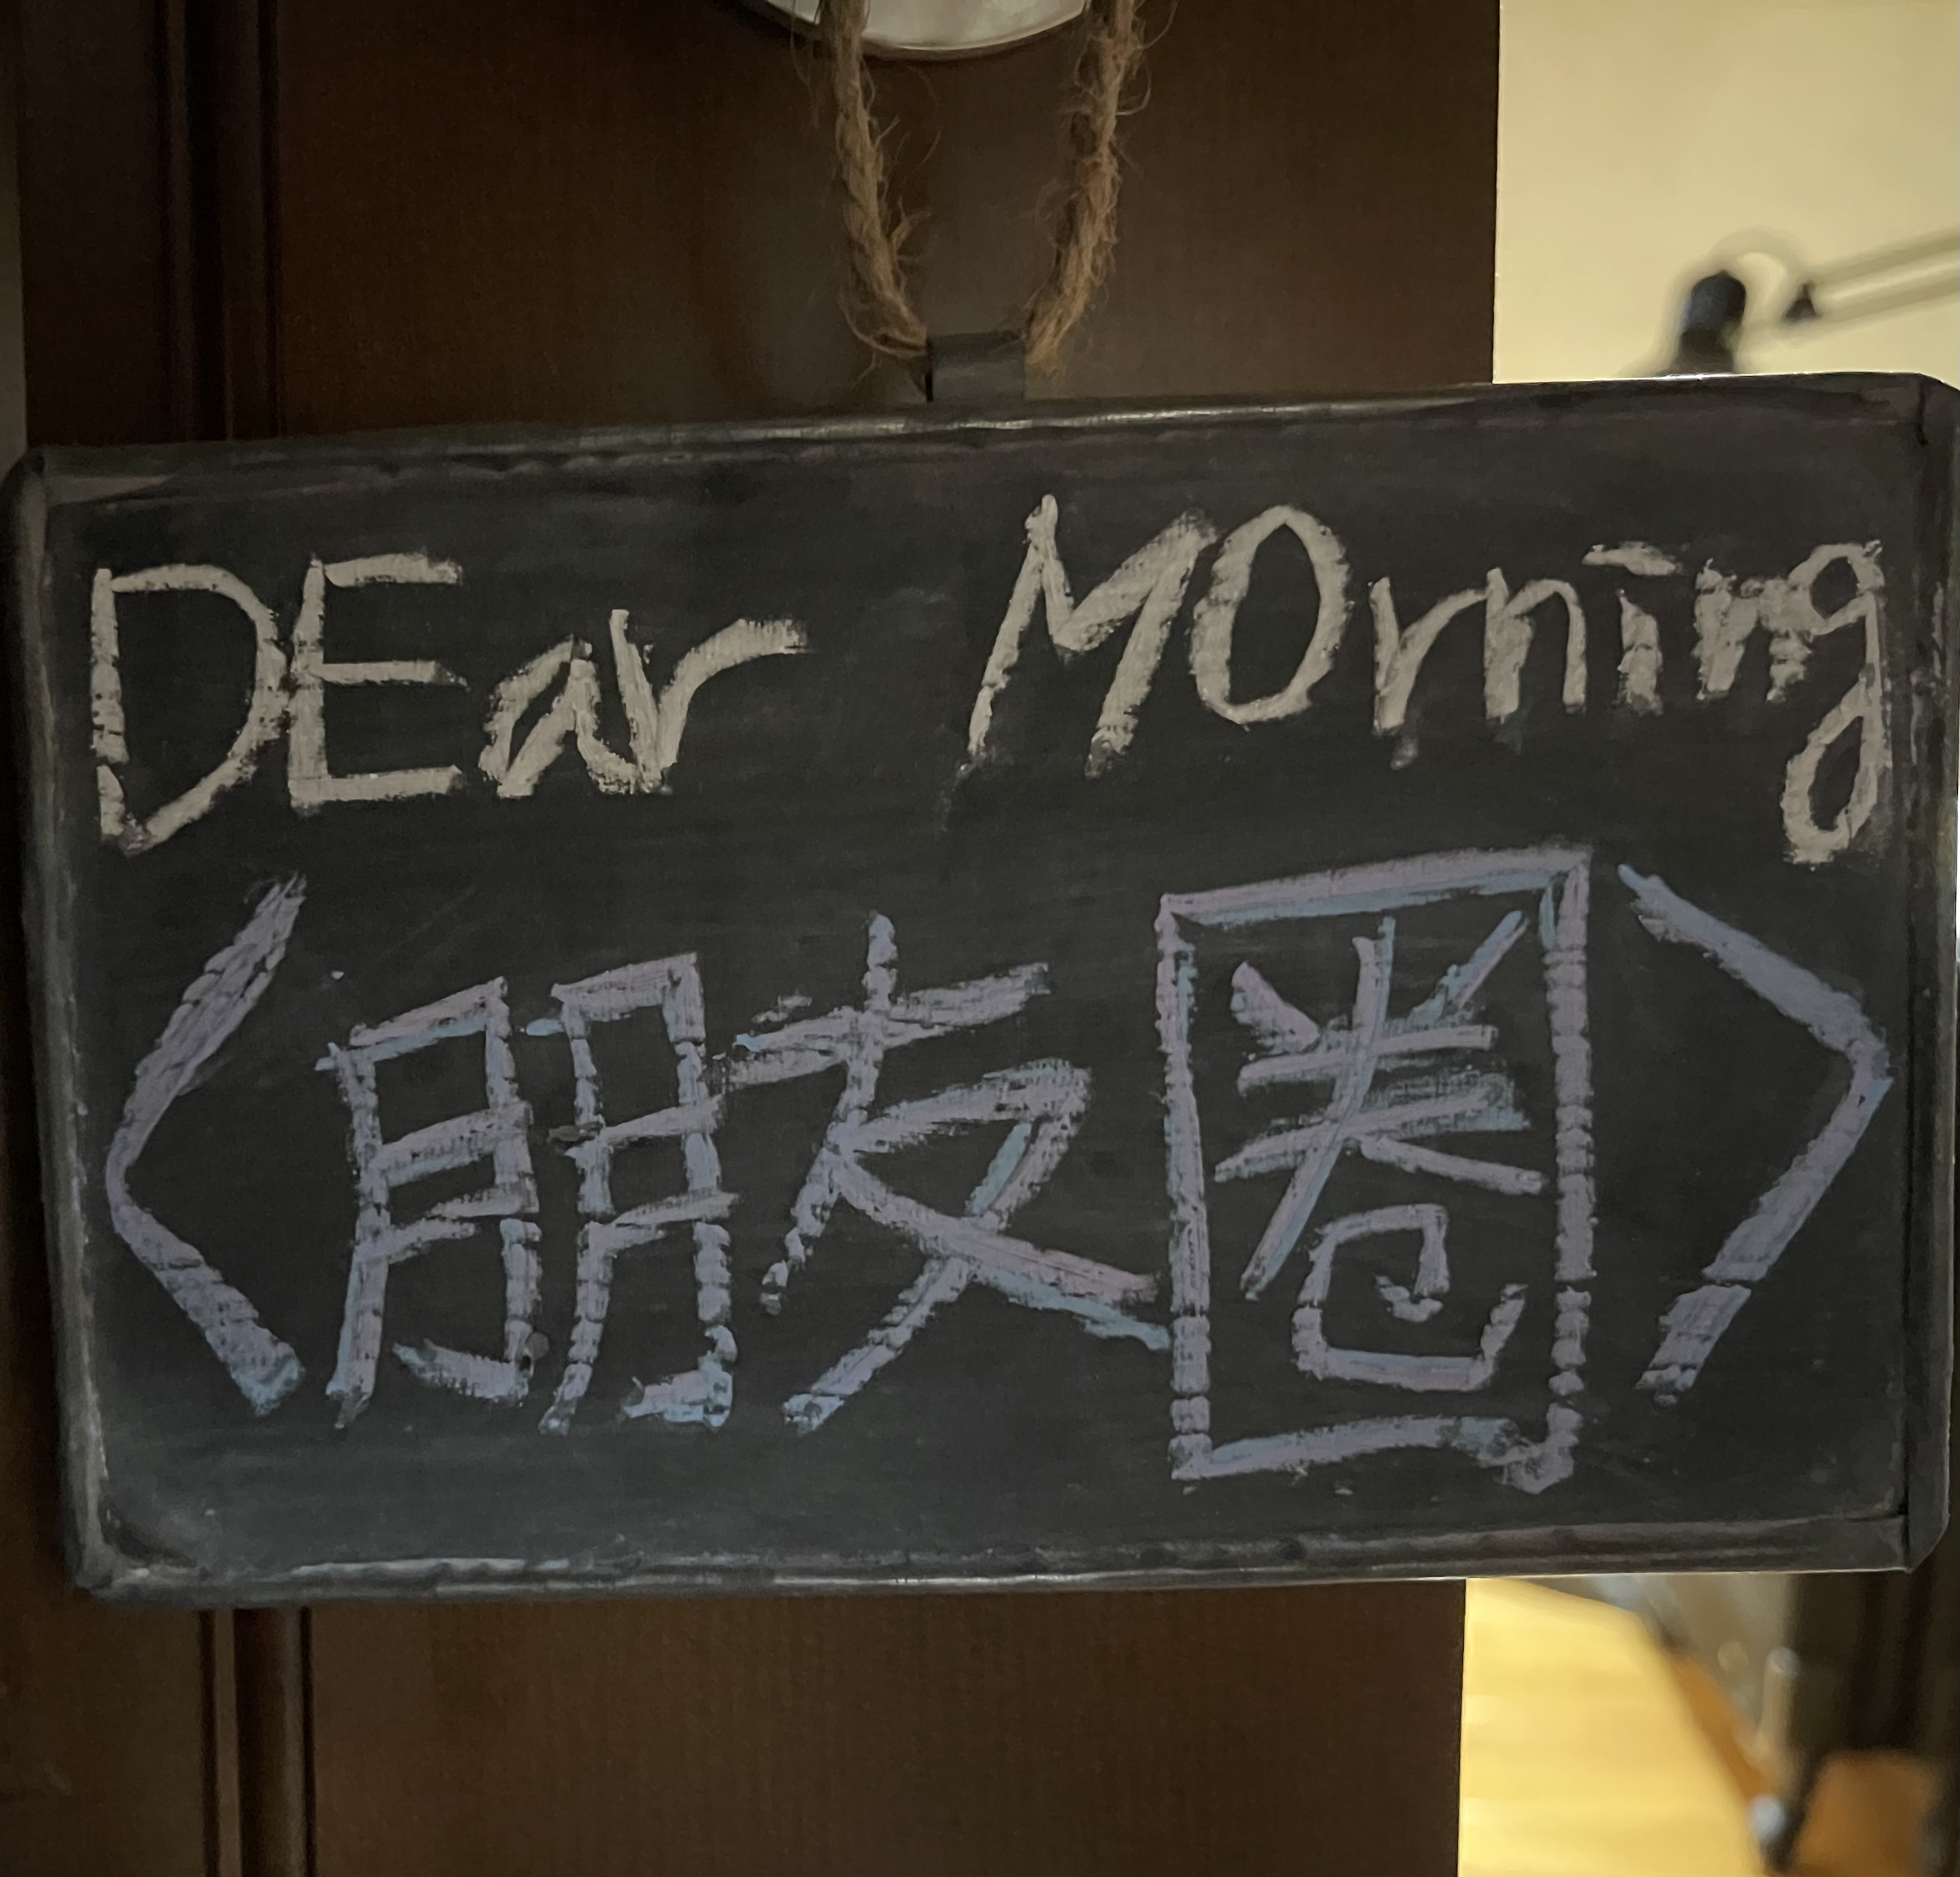 柒|DEar MOrning :〈 朋友圈 〉